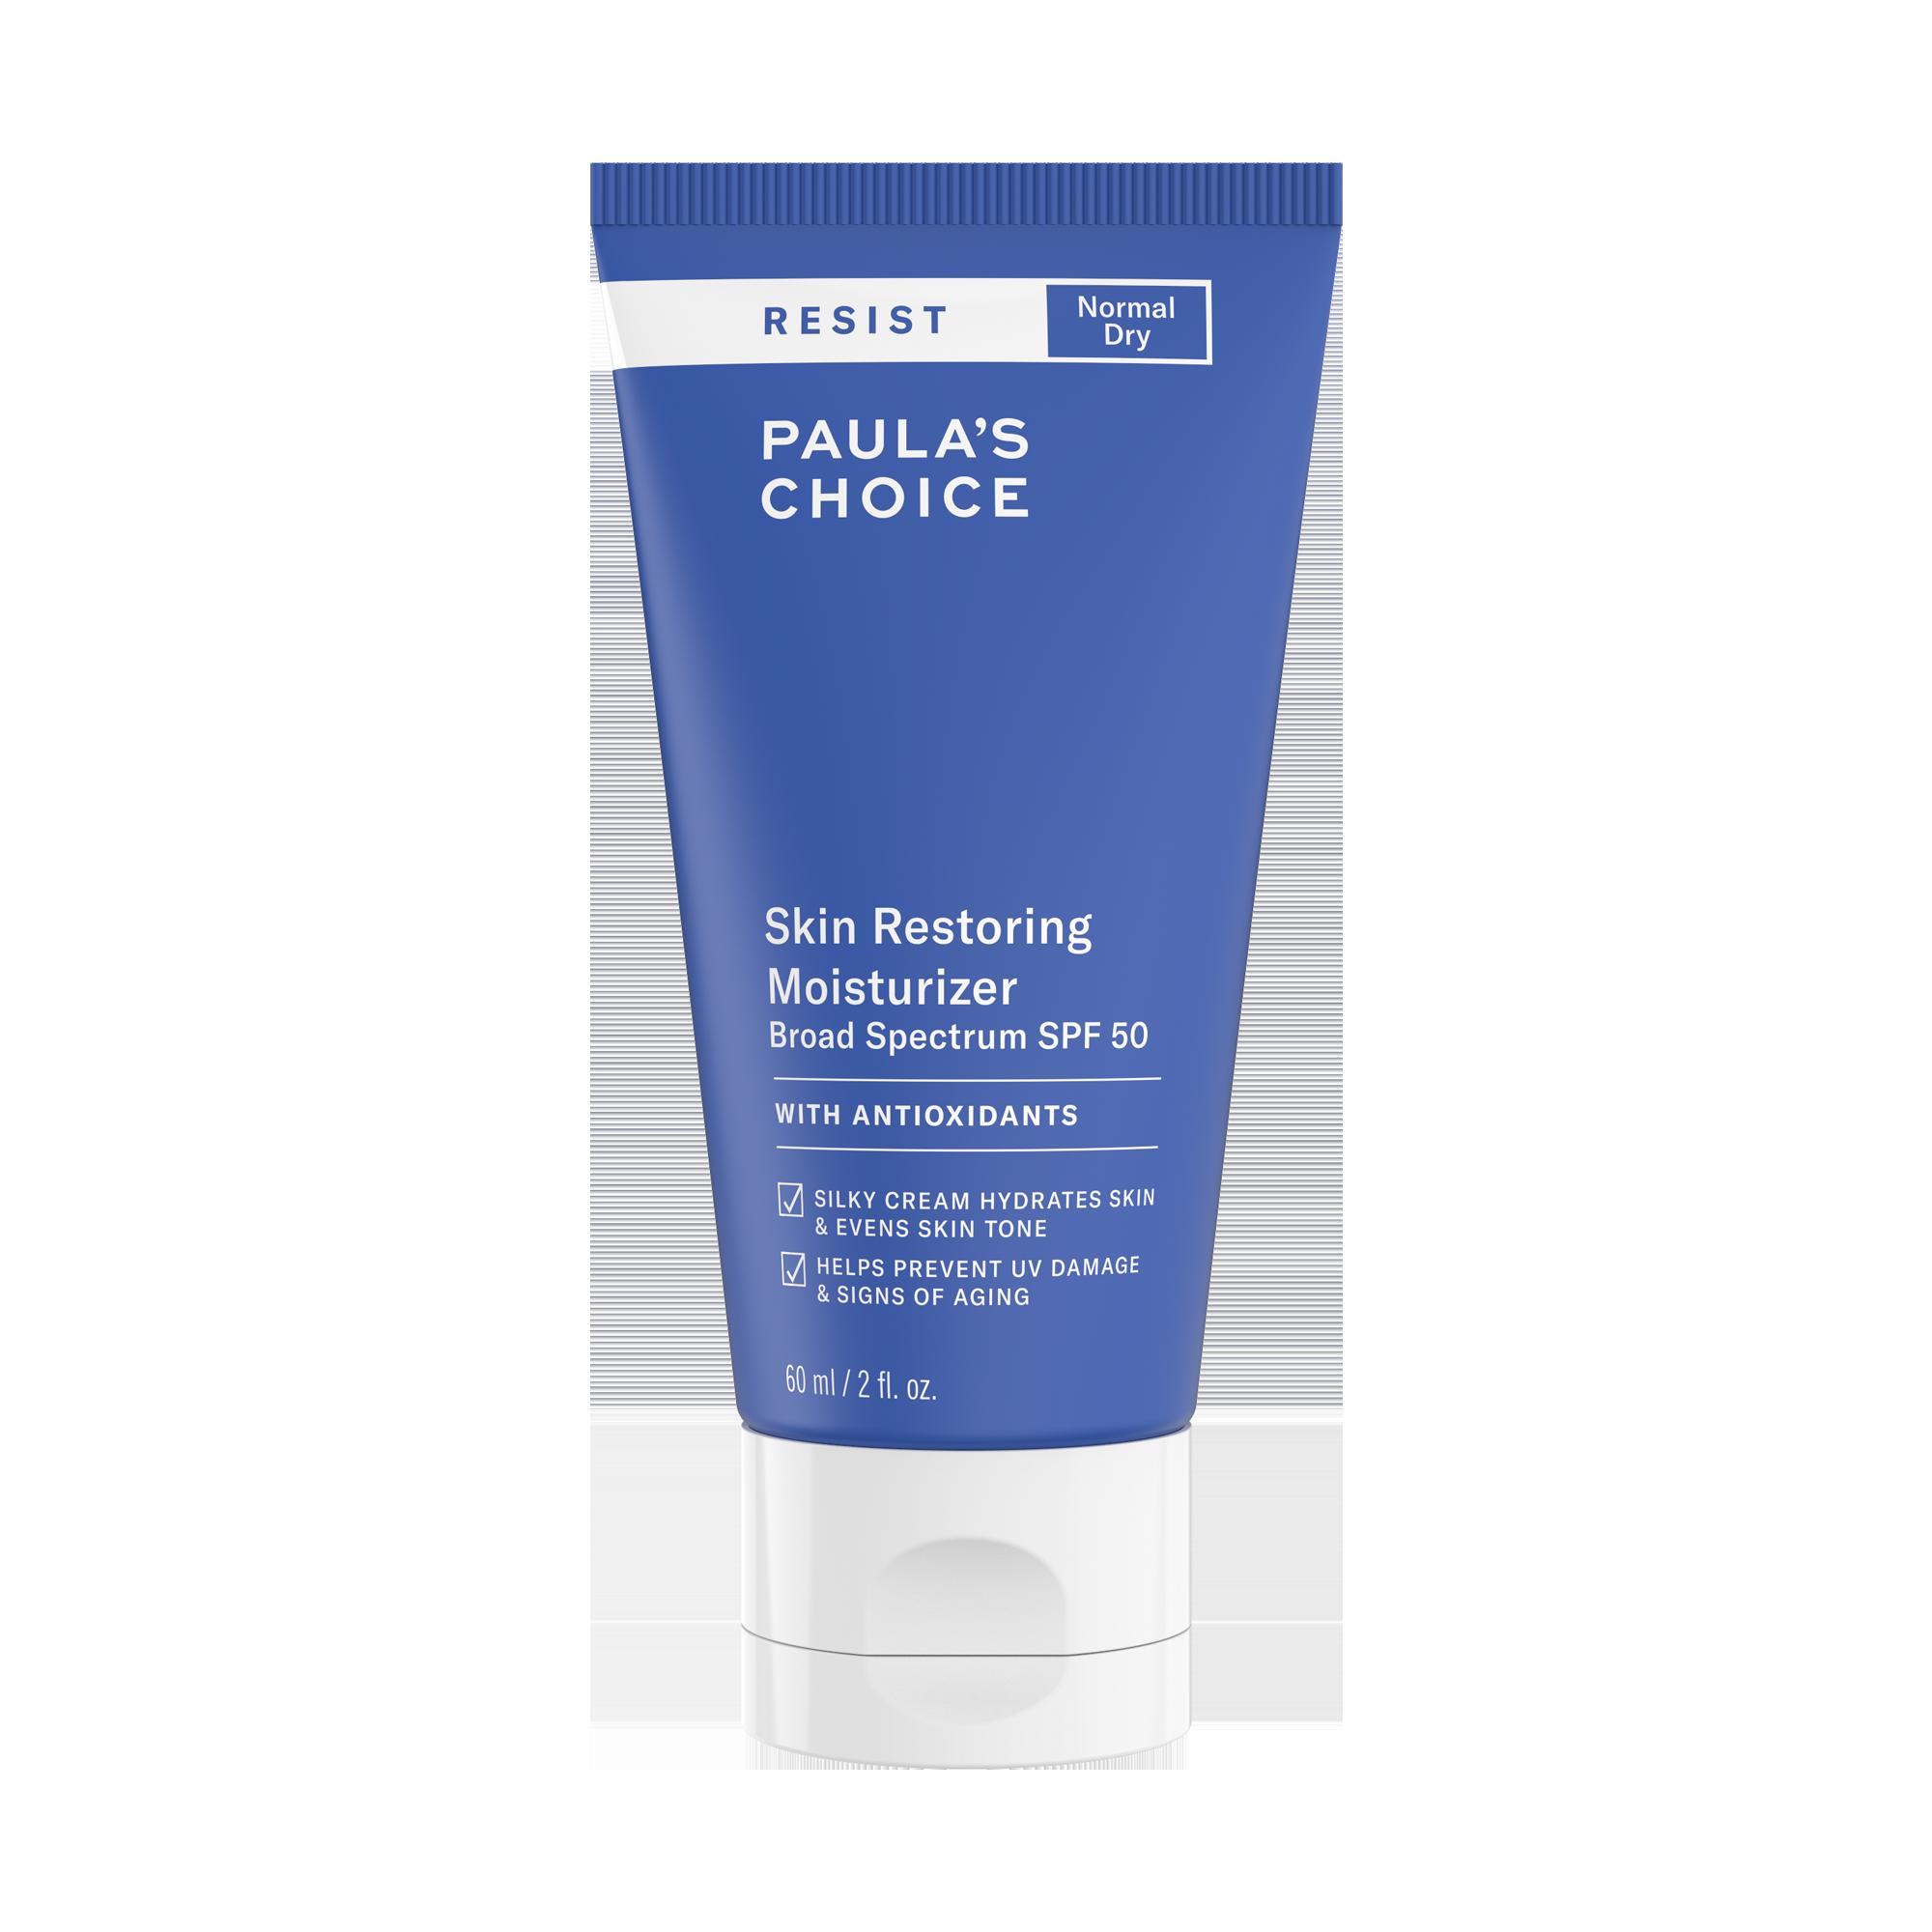 RESIST Skin Restoring Moisturizer with SPF 50 | Paula's